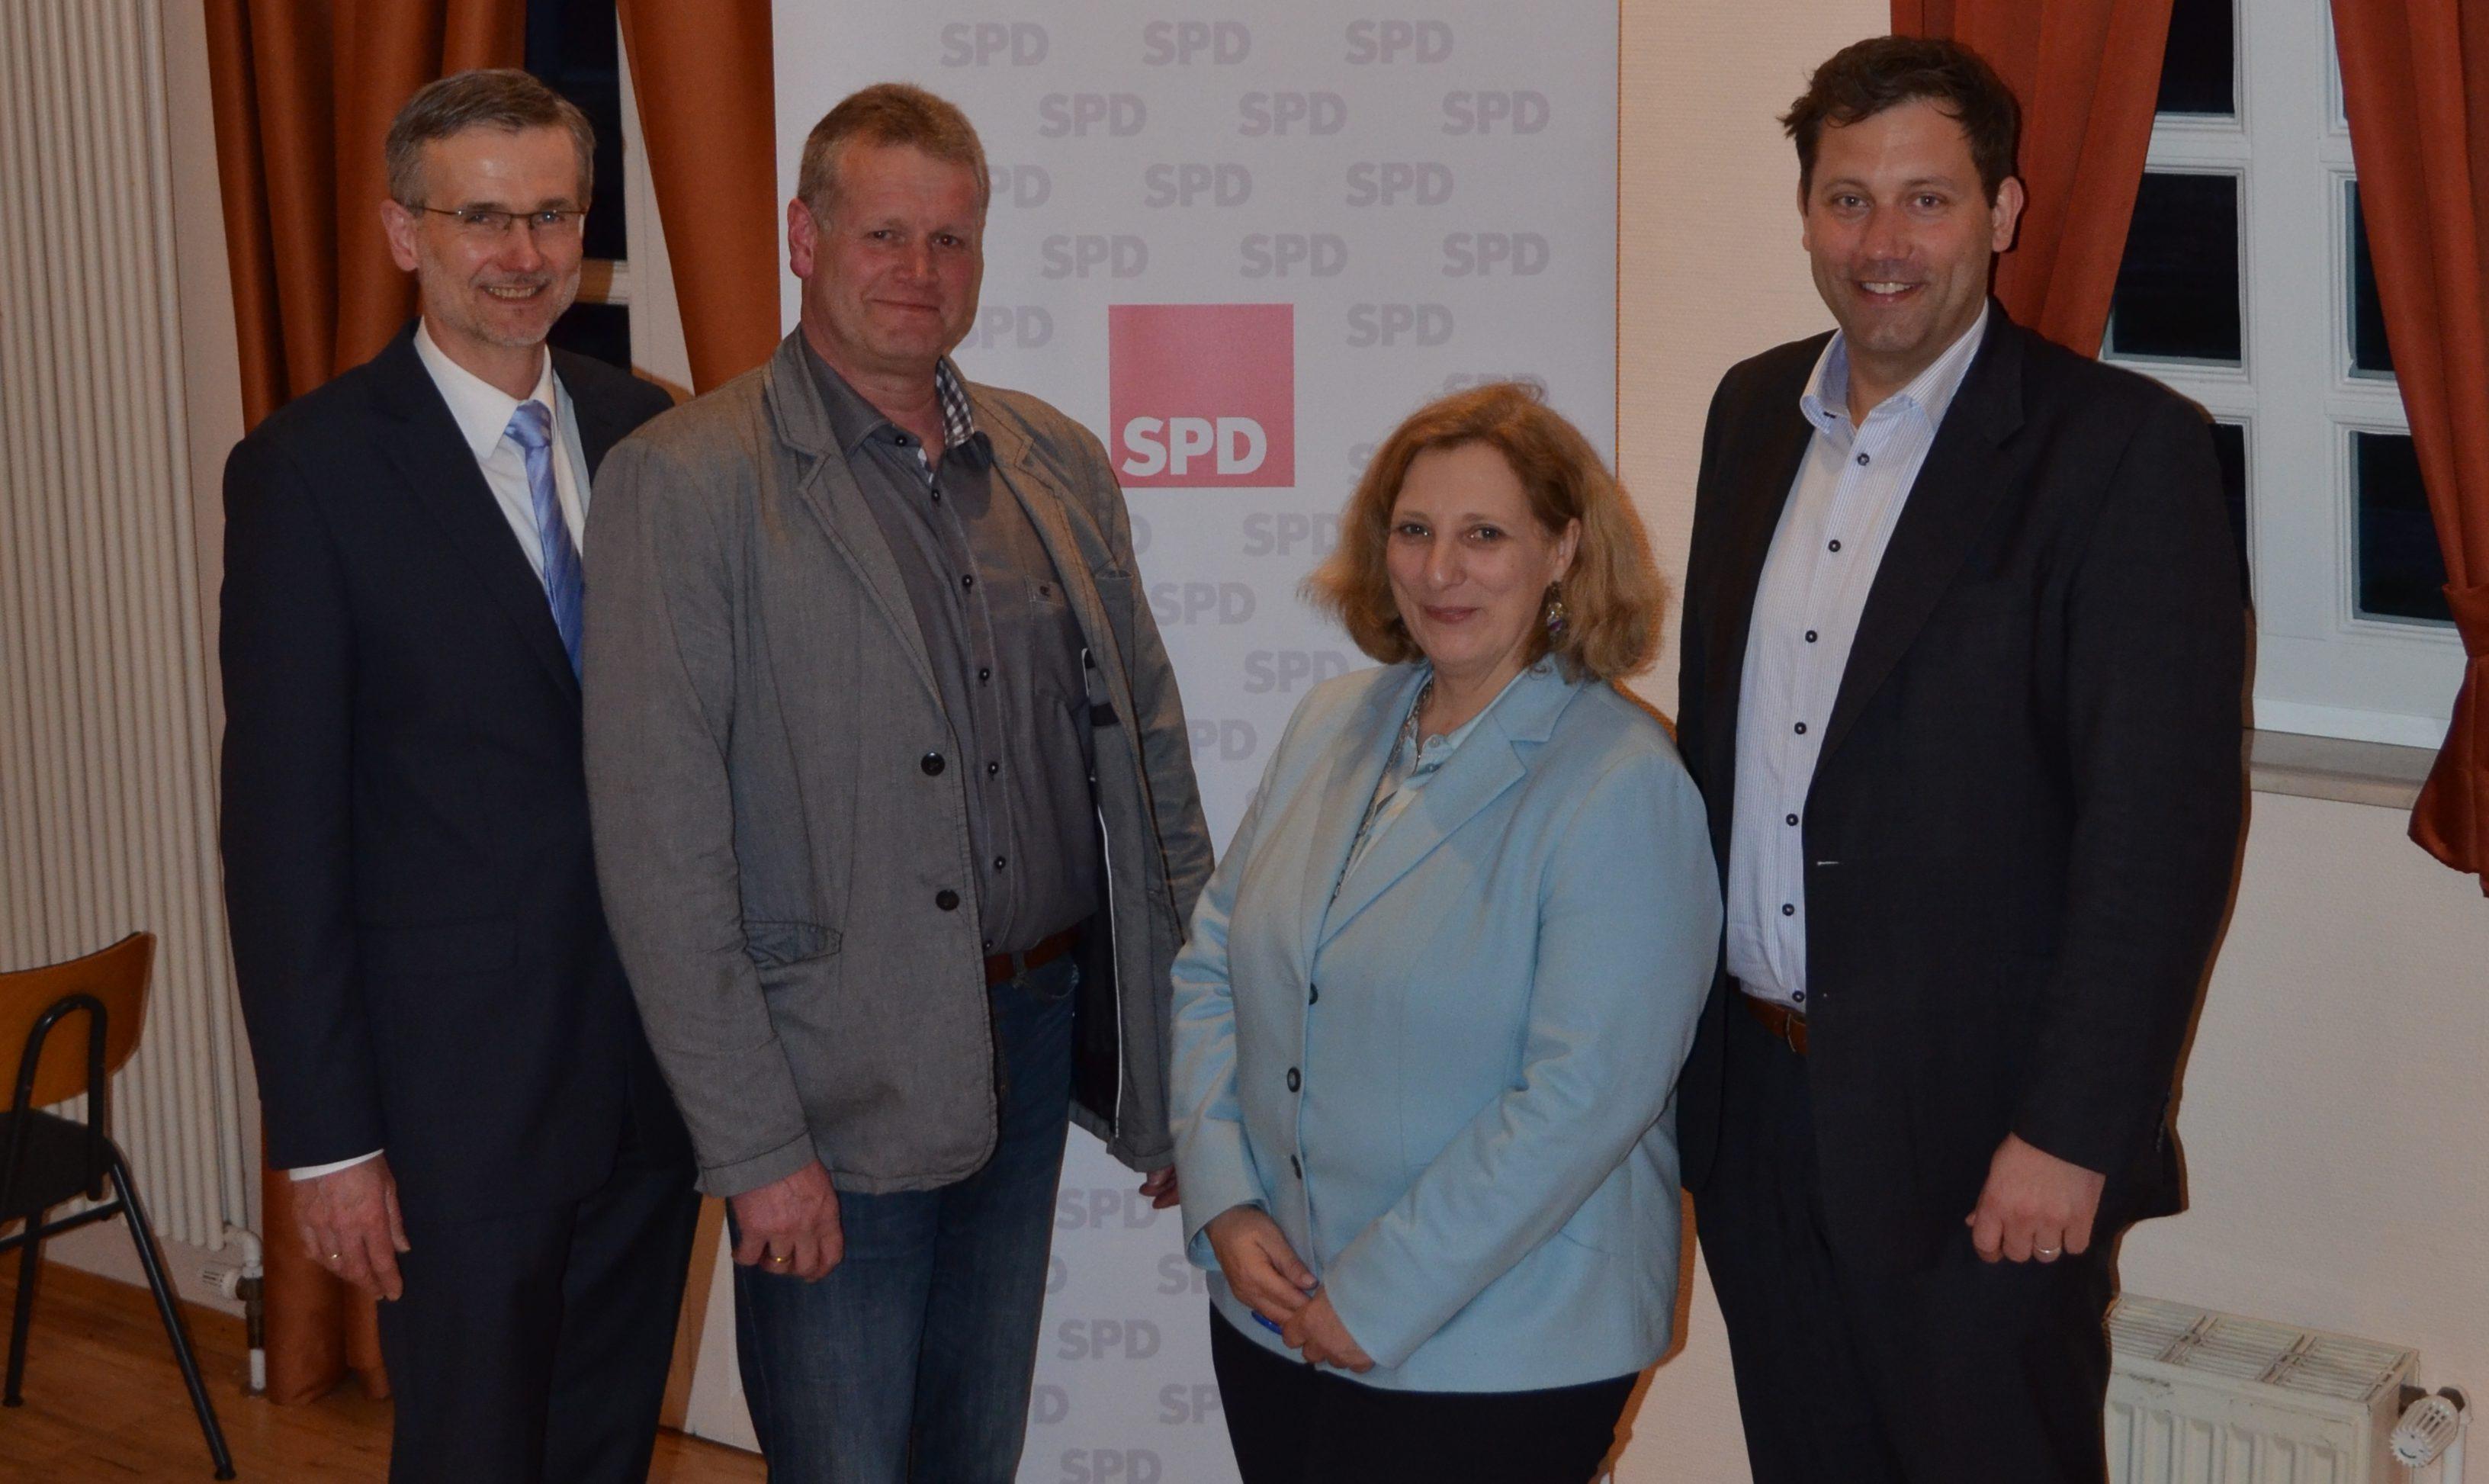 Eckhard Lammers, Horst Töller, Dr. Daniela De Ridder und Lars Klingbeil